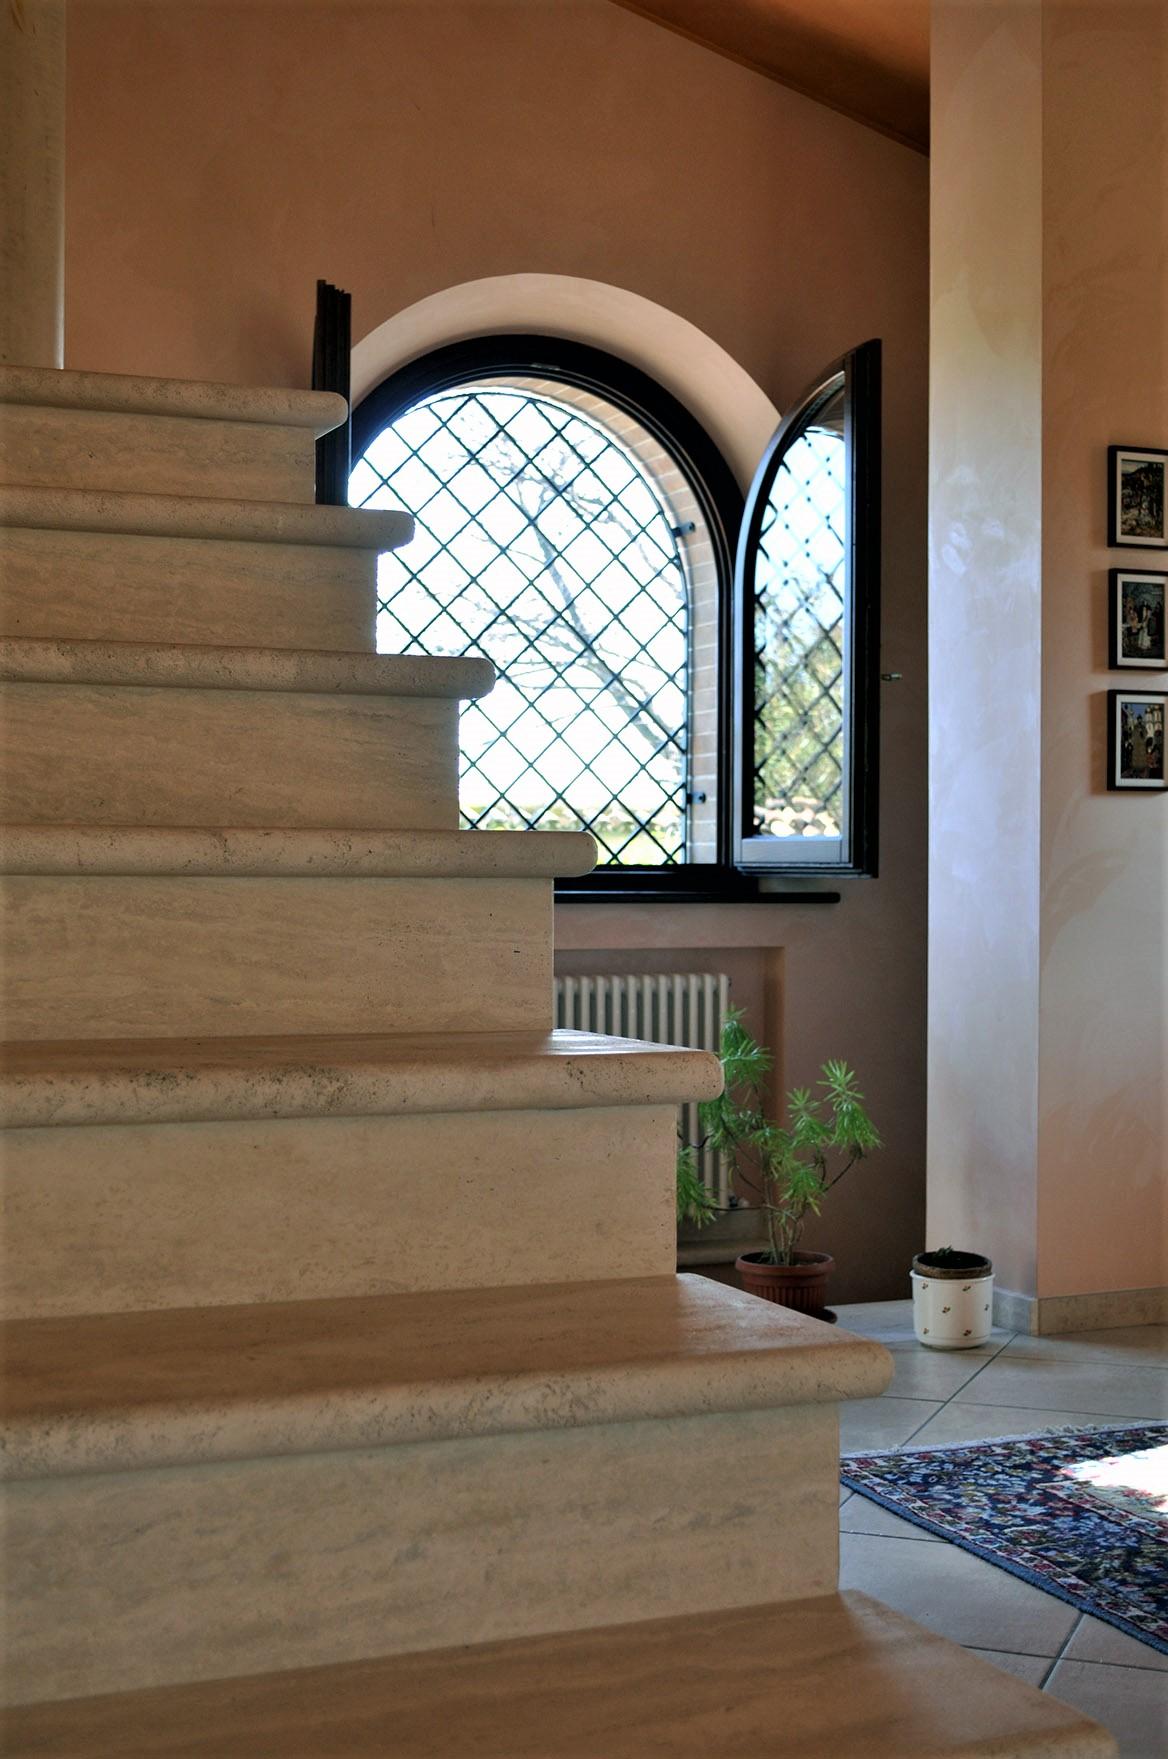 Villa Villa for sale Tortoreto (TE), Villa Bianca - Tortoreto - EUR 770.233 600